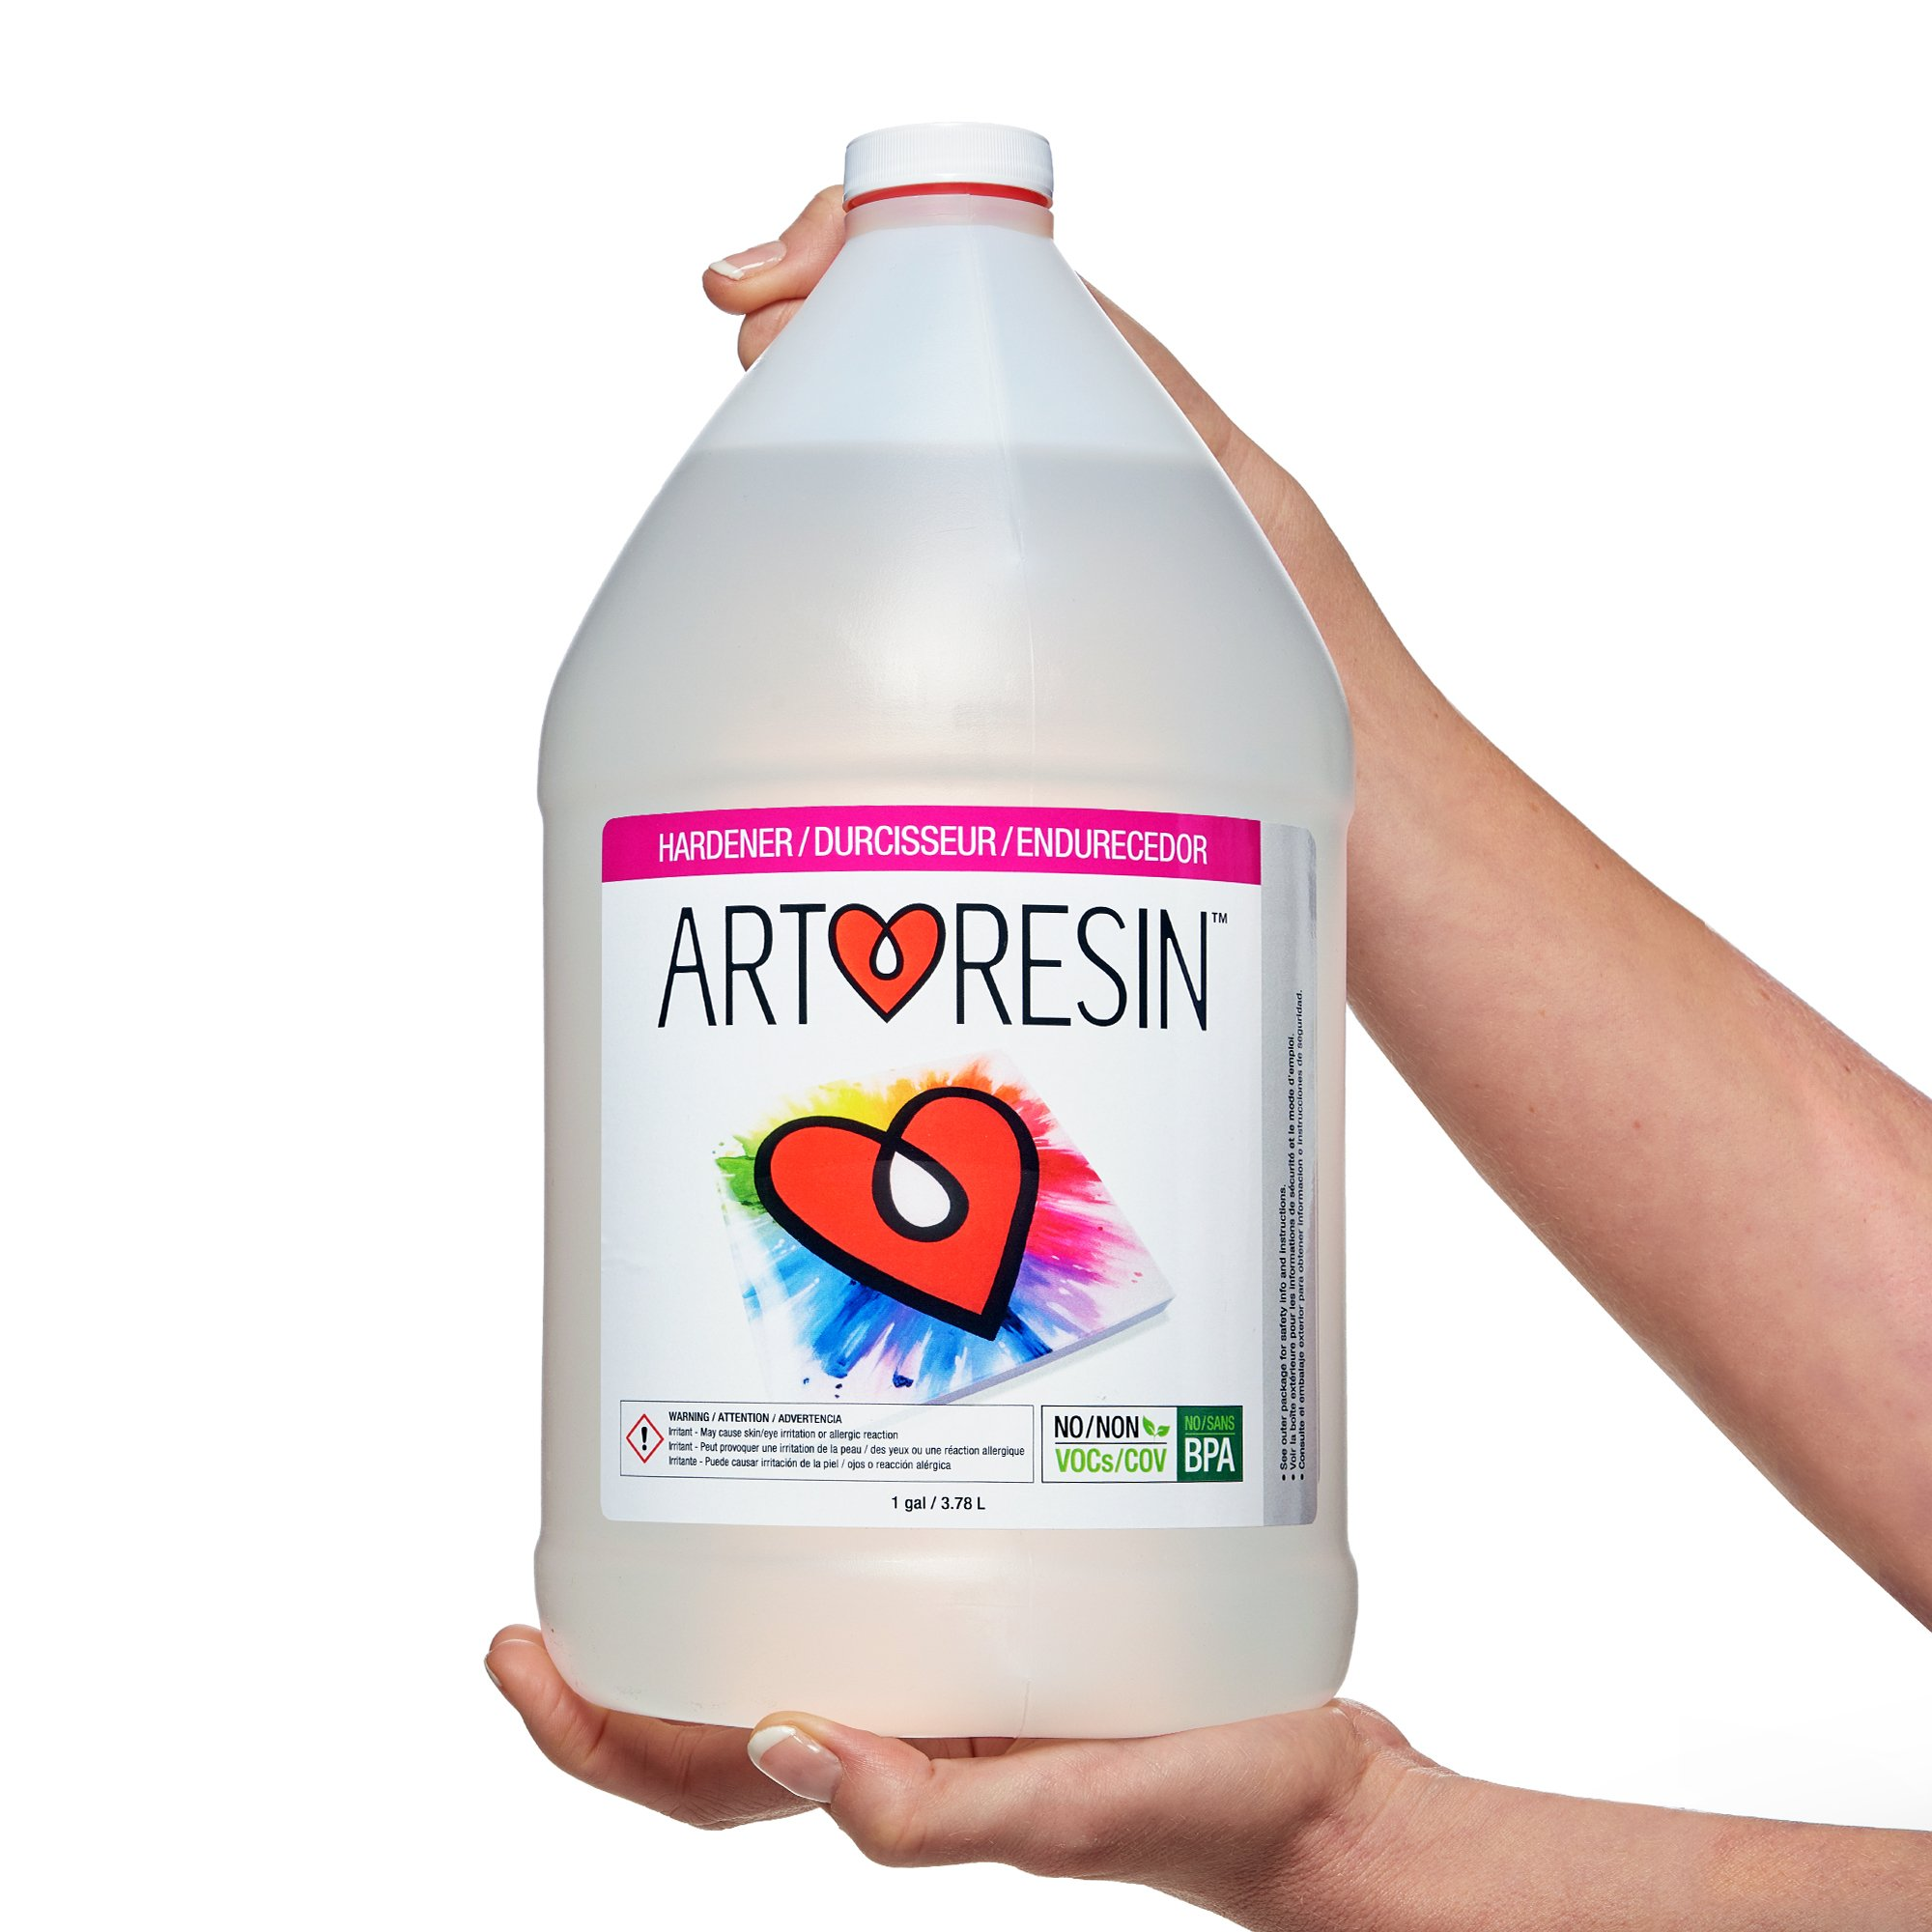 ArtResin - Epoxy Resin - Clear - Non-Toxic - 4 gal (15.14L)